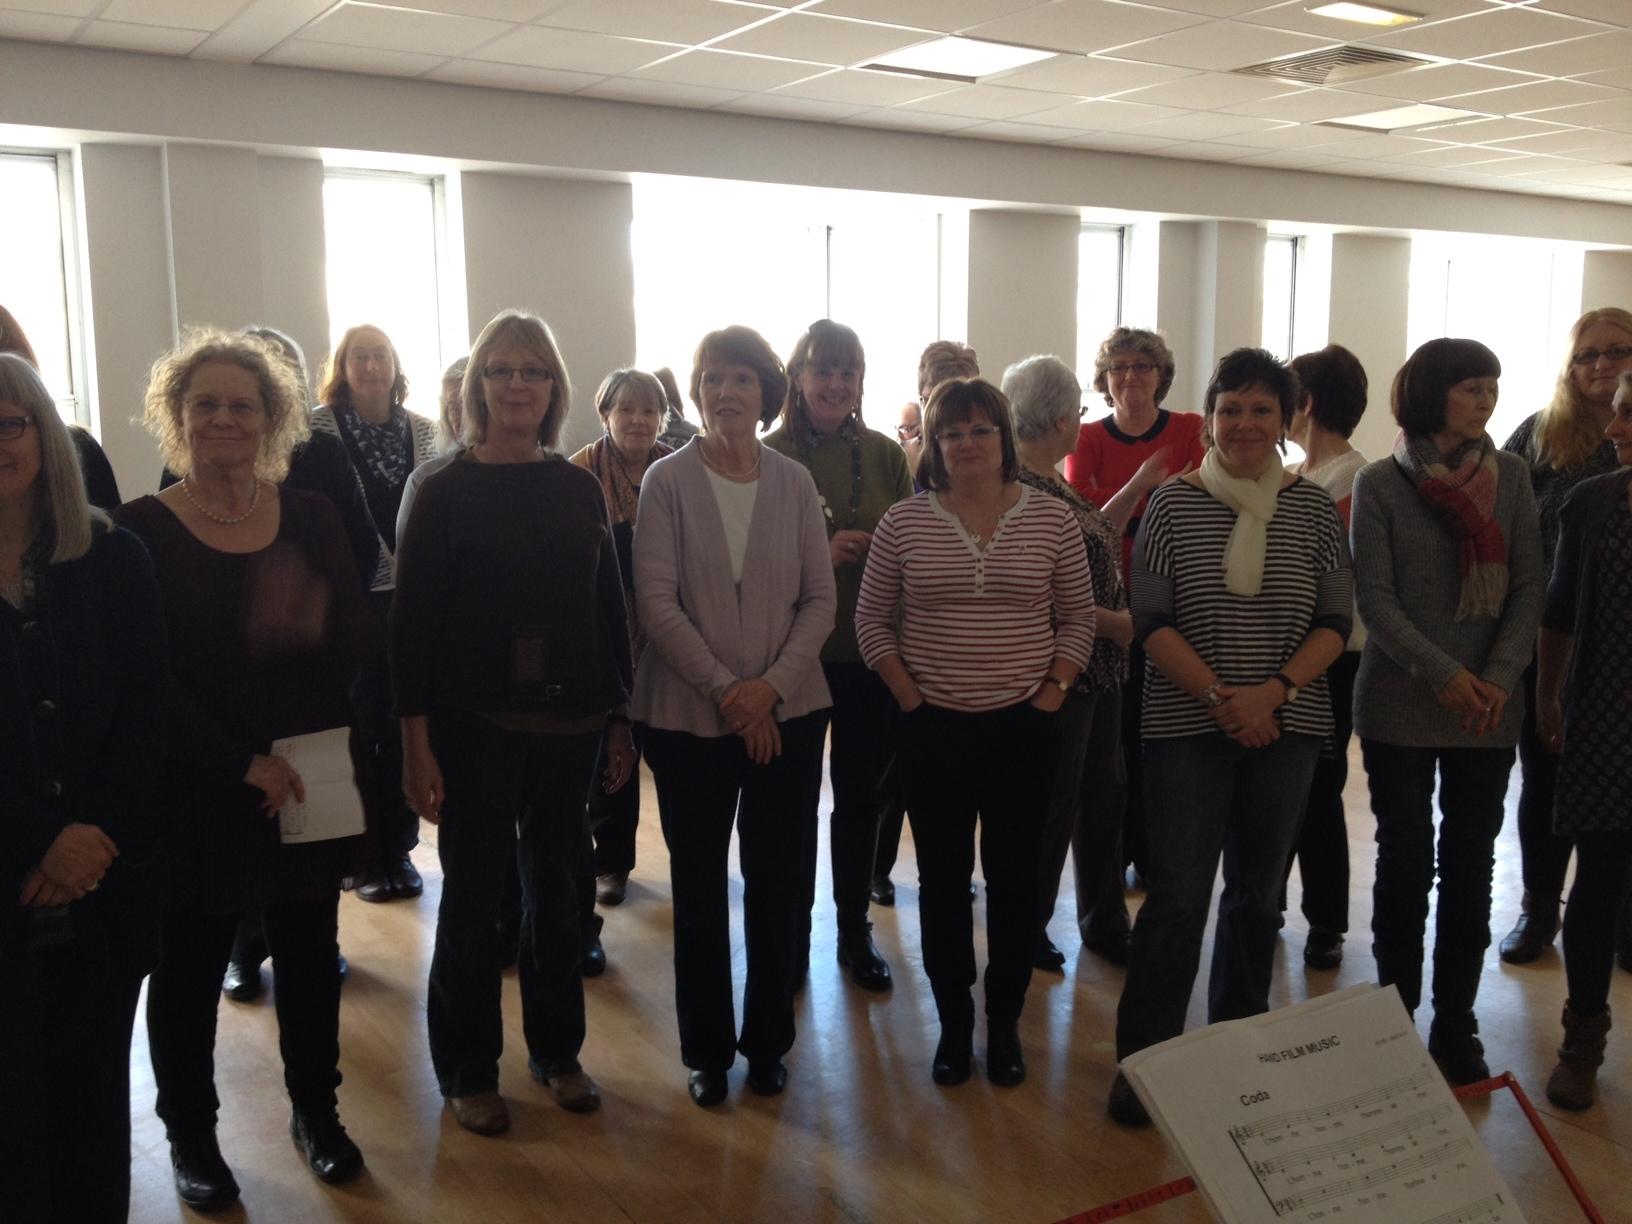 Anton Hecht Hand Music 1.3.2014 choir indoors